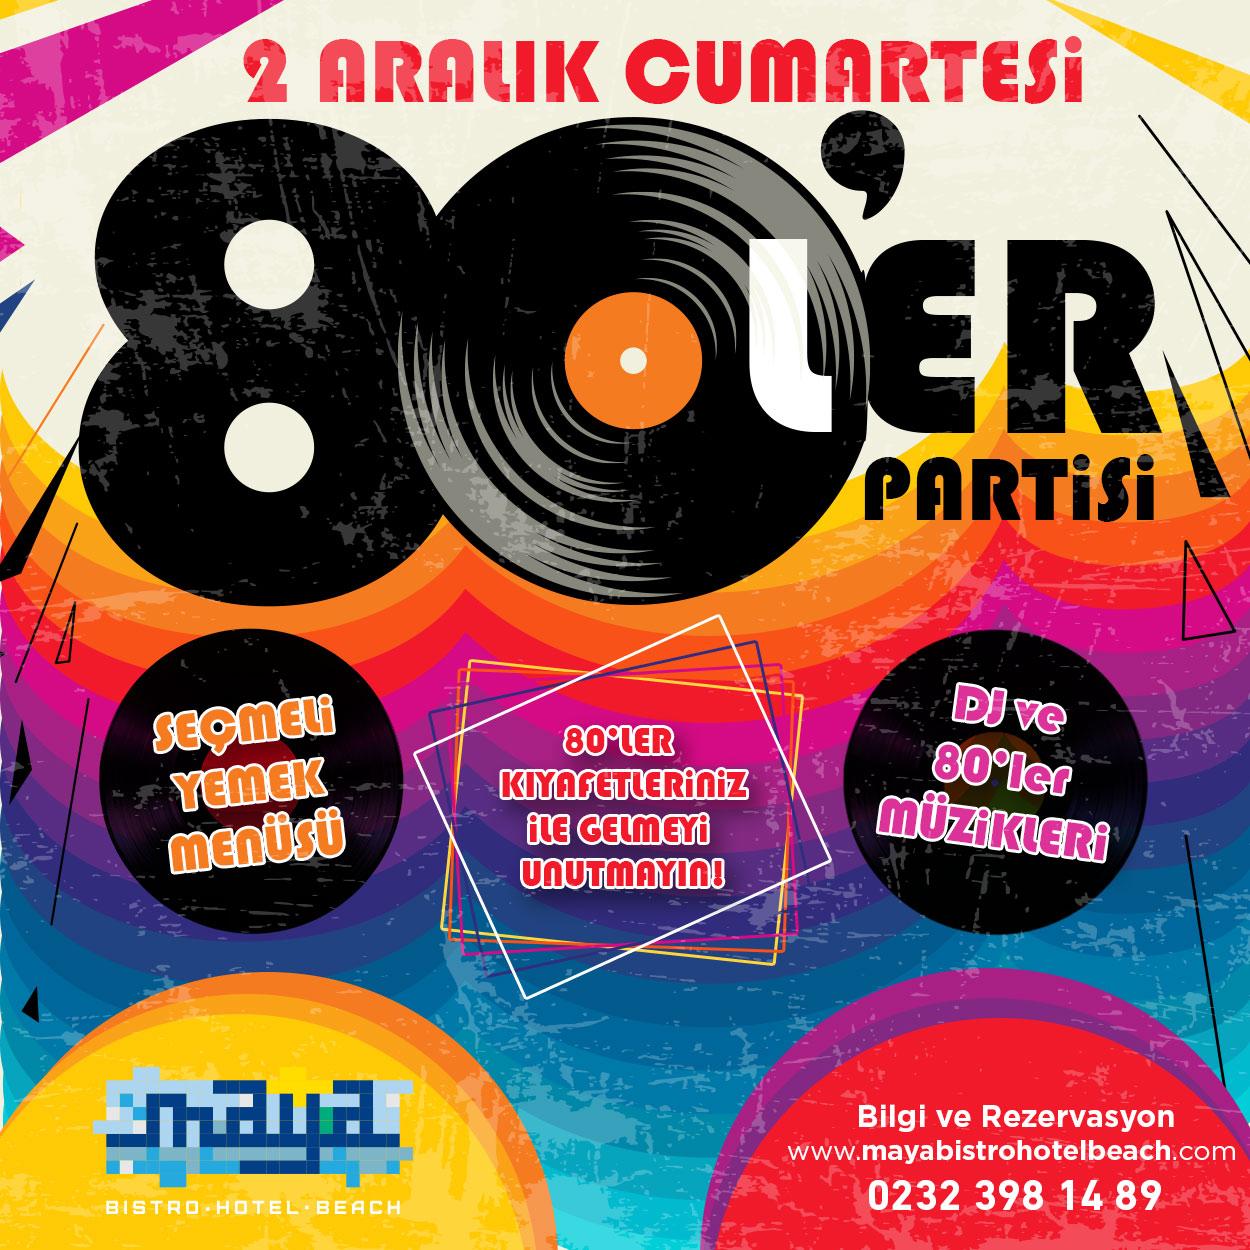 80'LER PARTİSİ